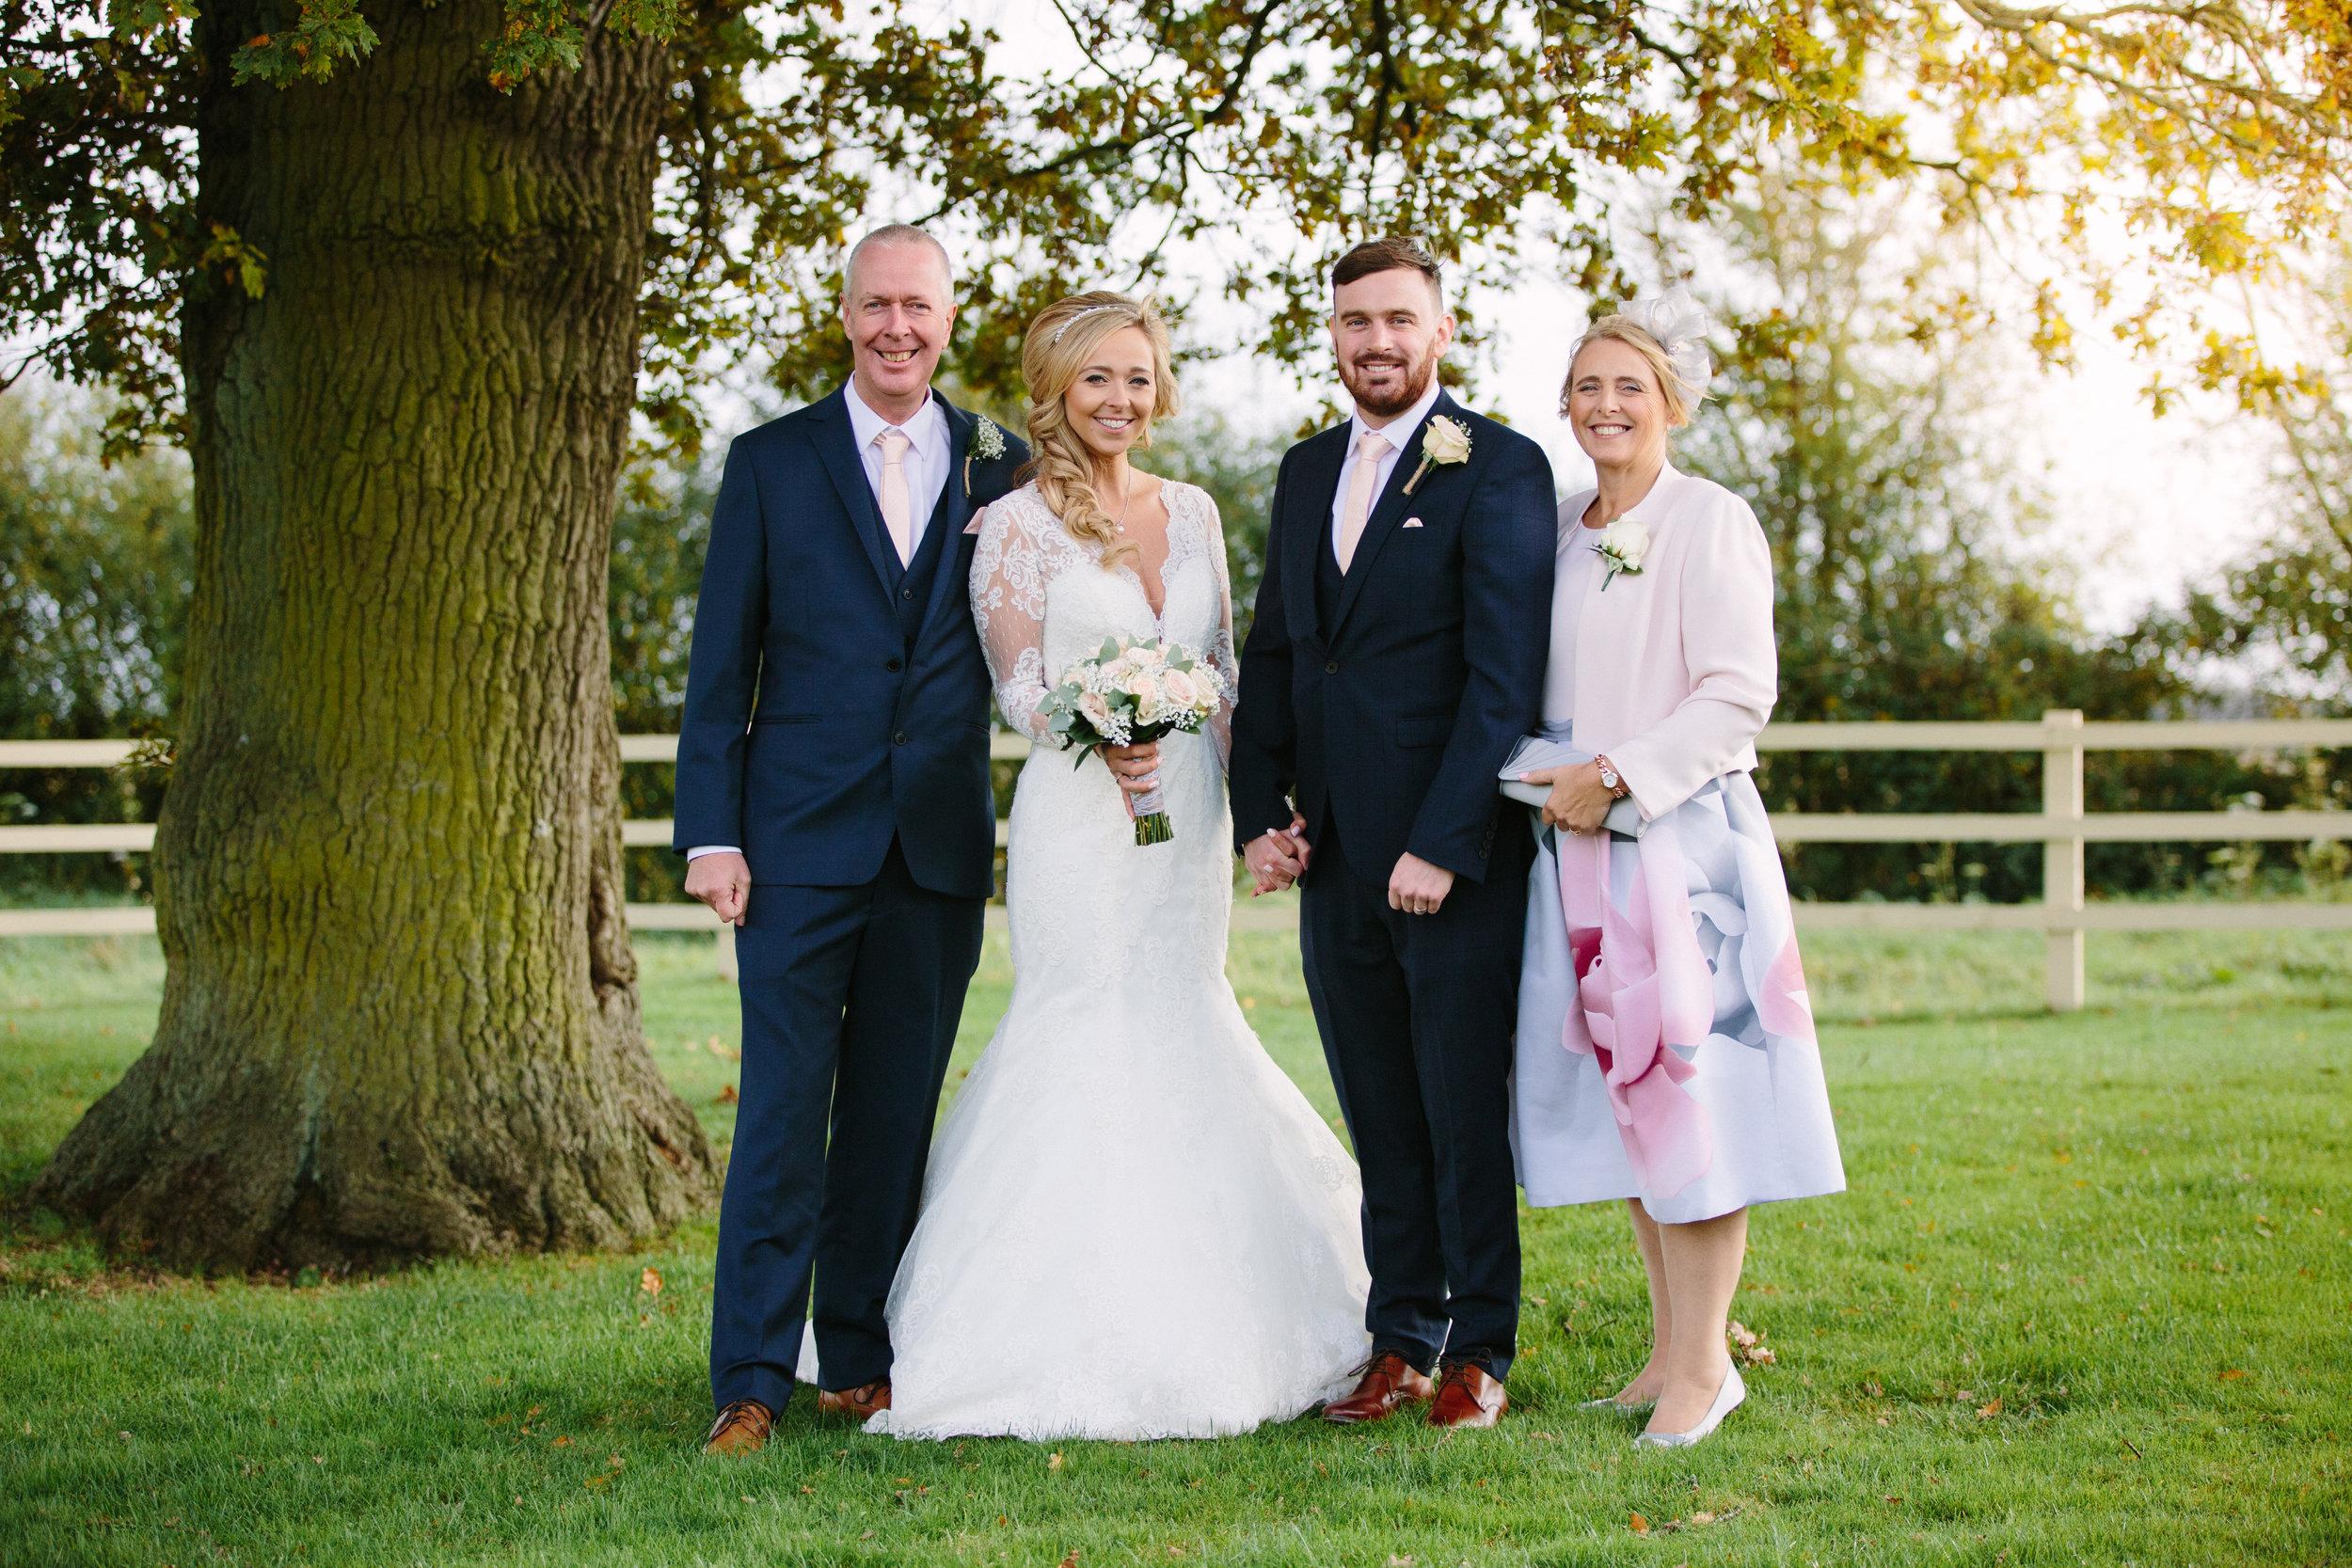 london-hertfordshire-wedding-photography-milling-barn-ceremony-50